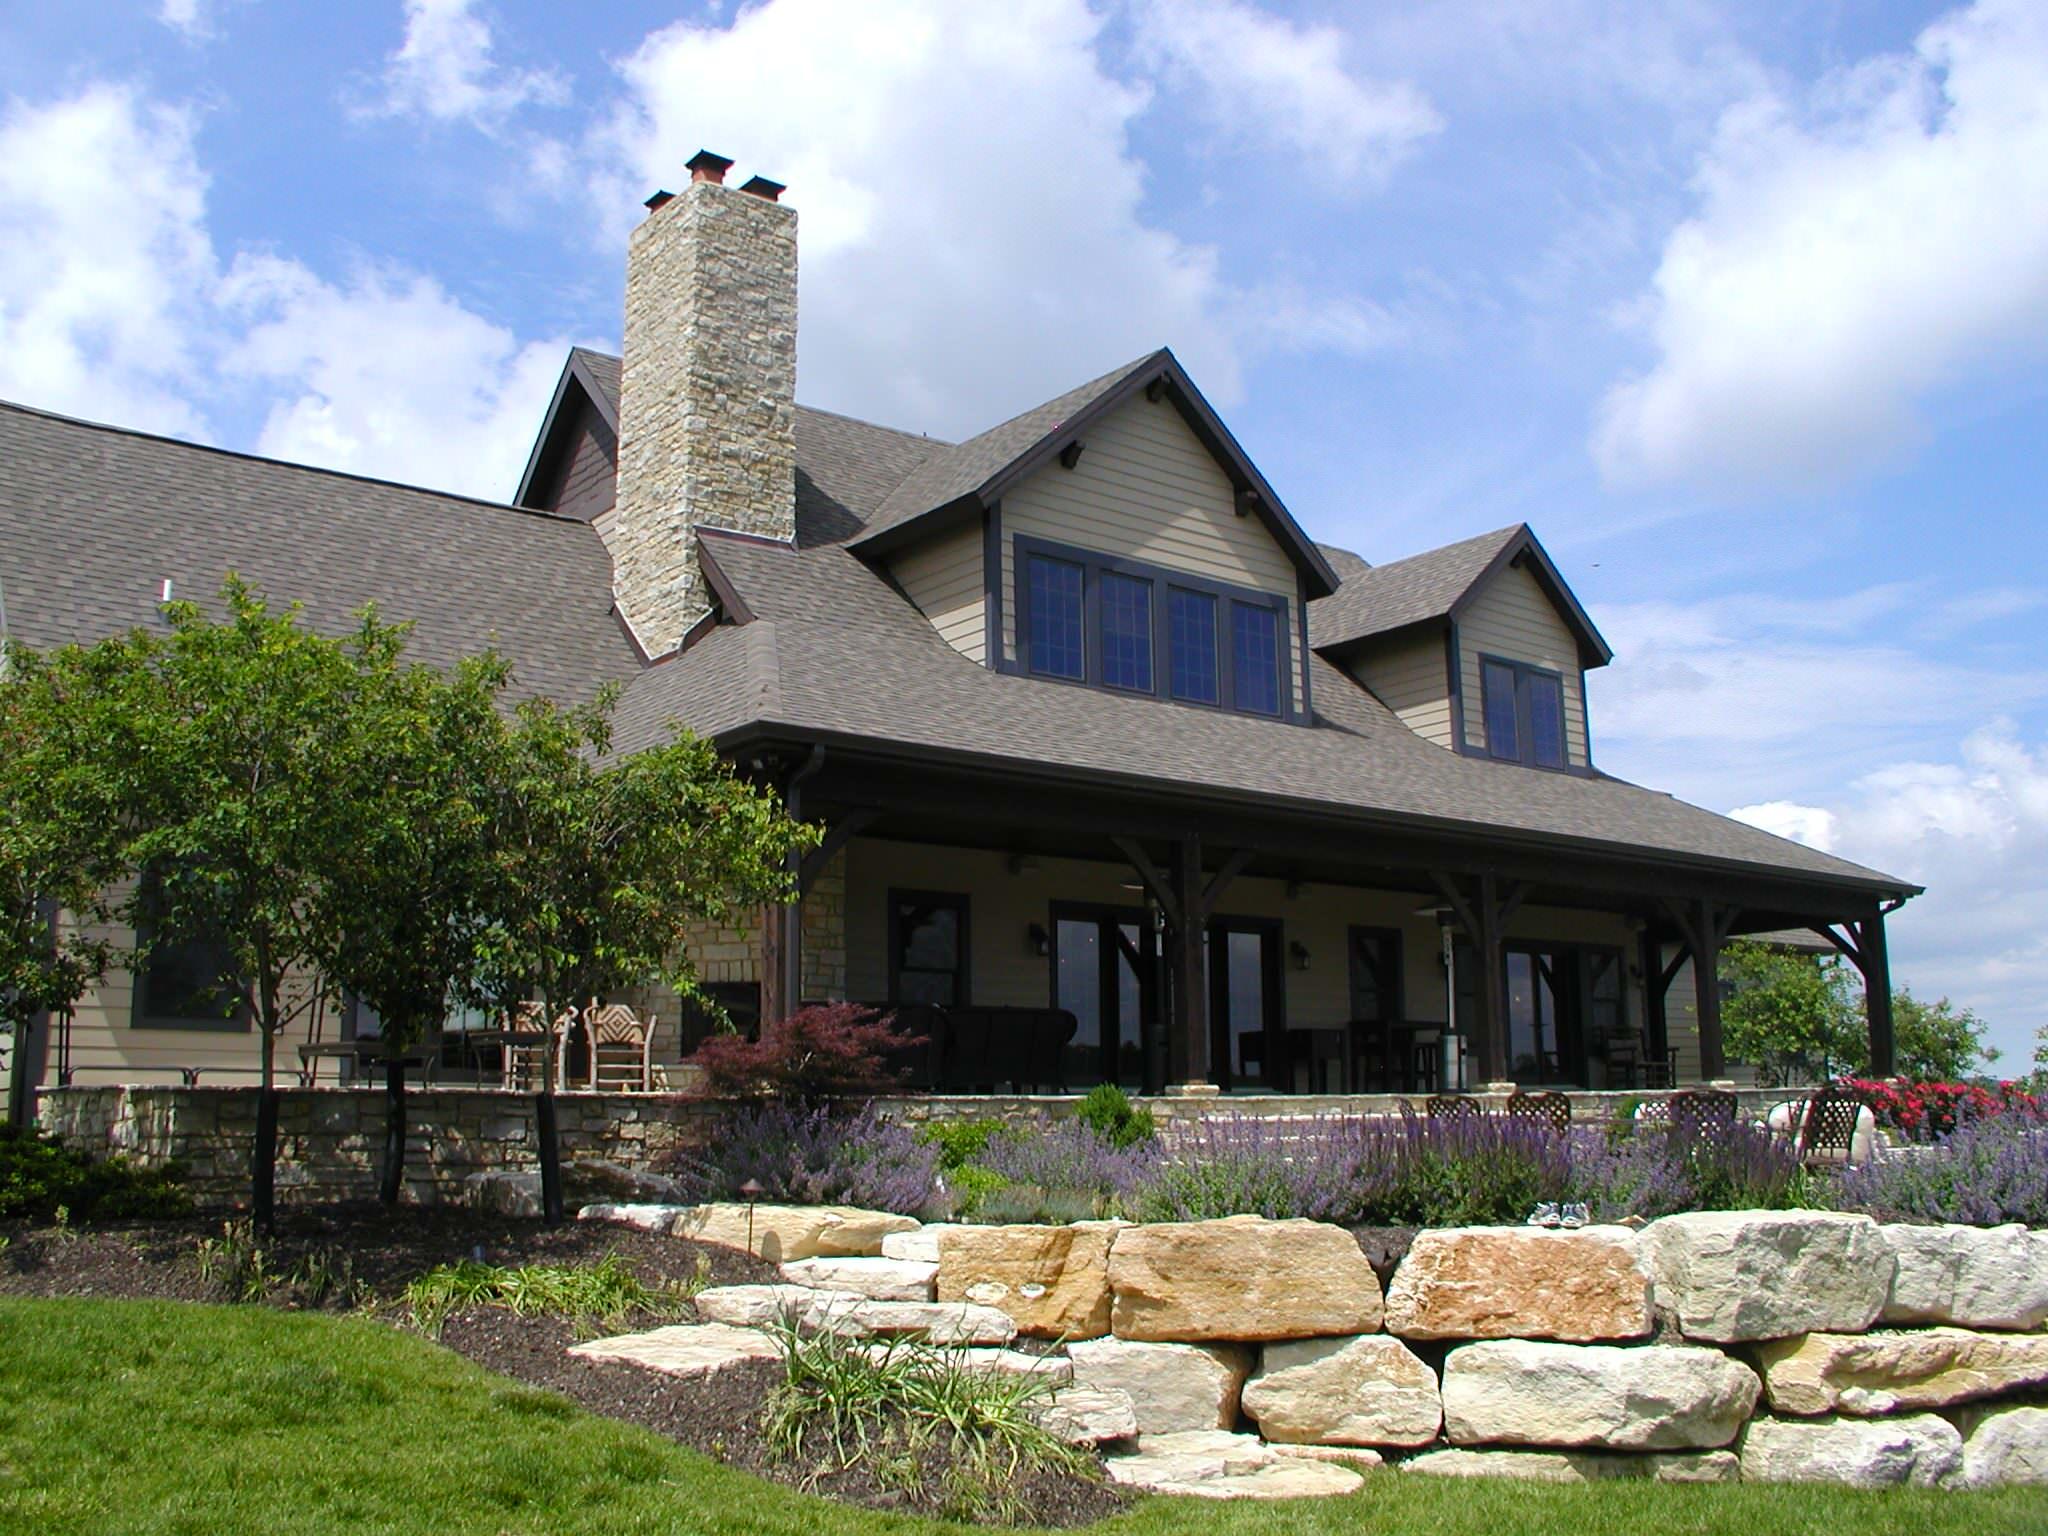 Farm house in Northeast Missouri